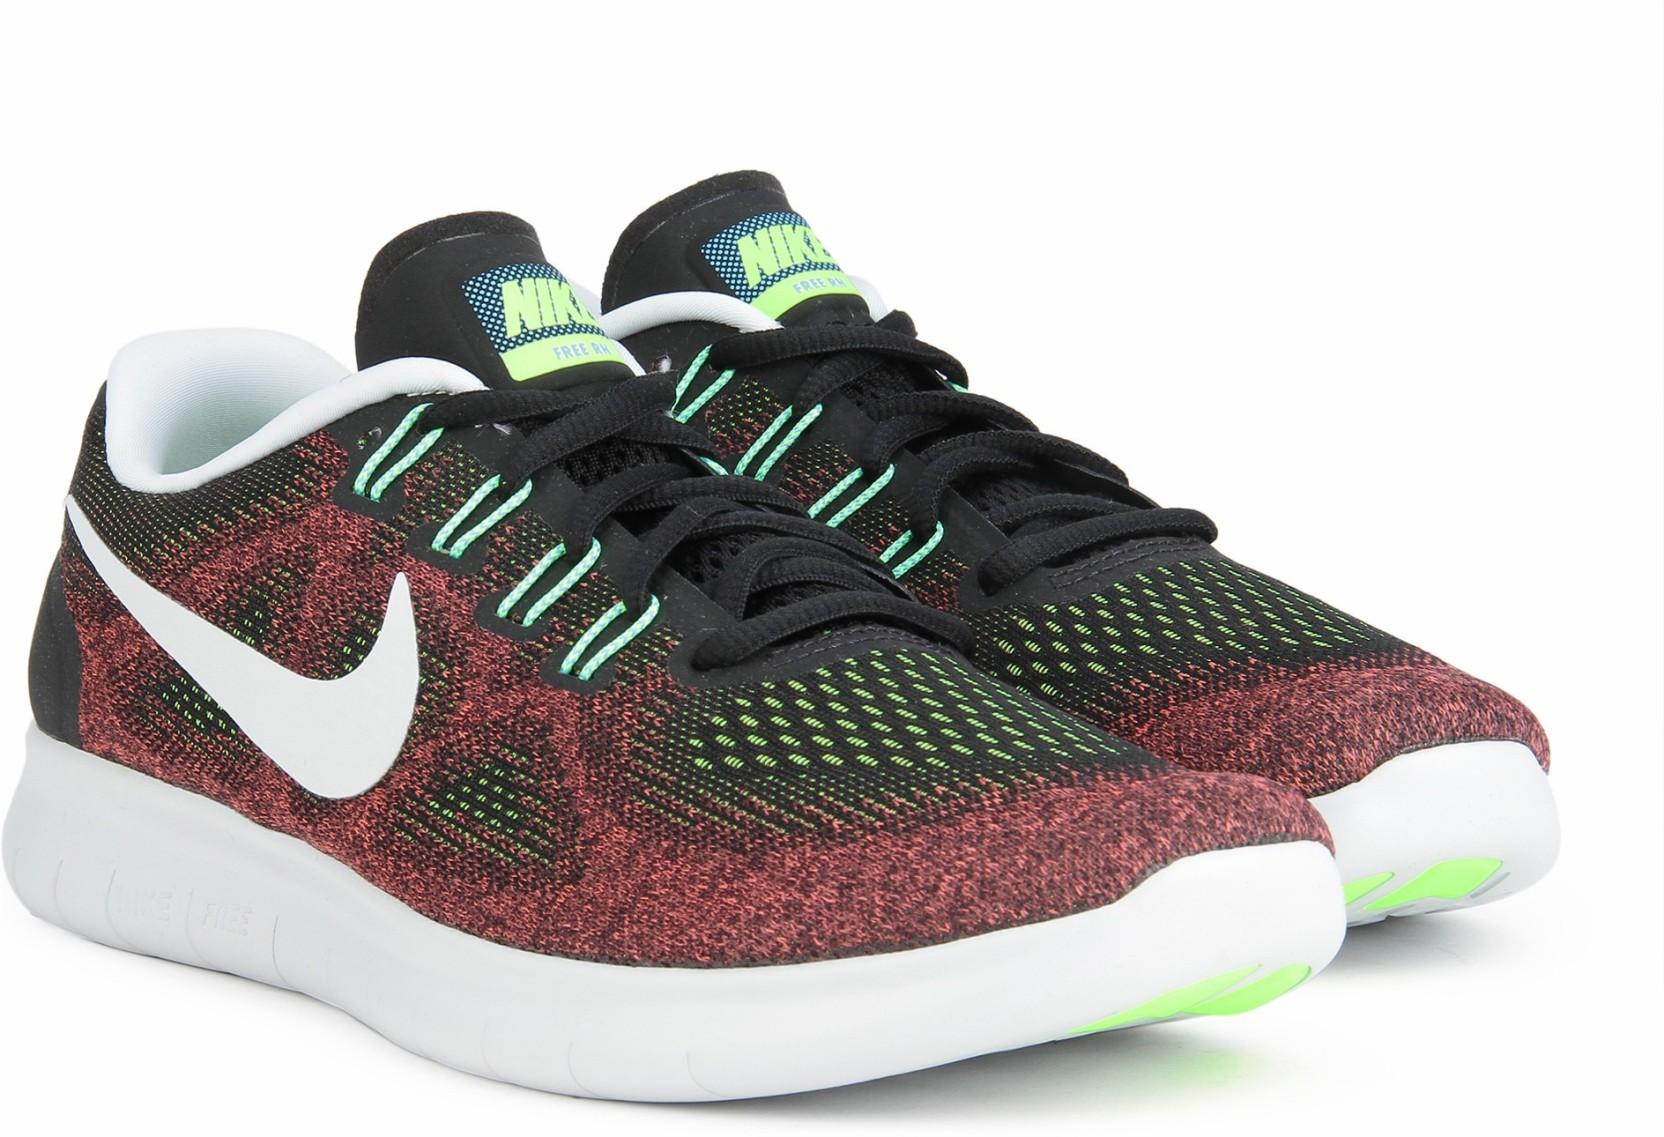 6f449d017934 Nike FREE RN 2017 Running Shoes For Men - Buy BLACK BLACK-HOT PUNCH ...